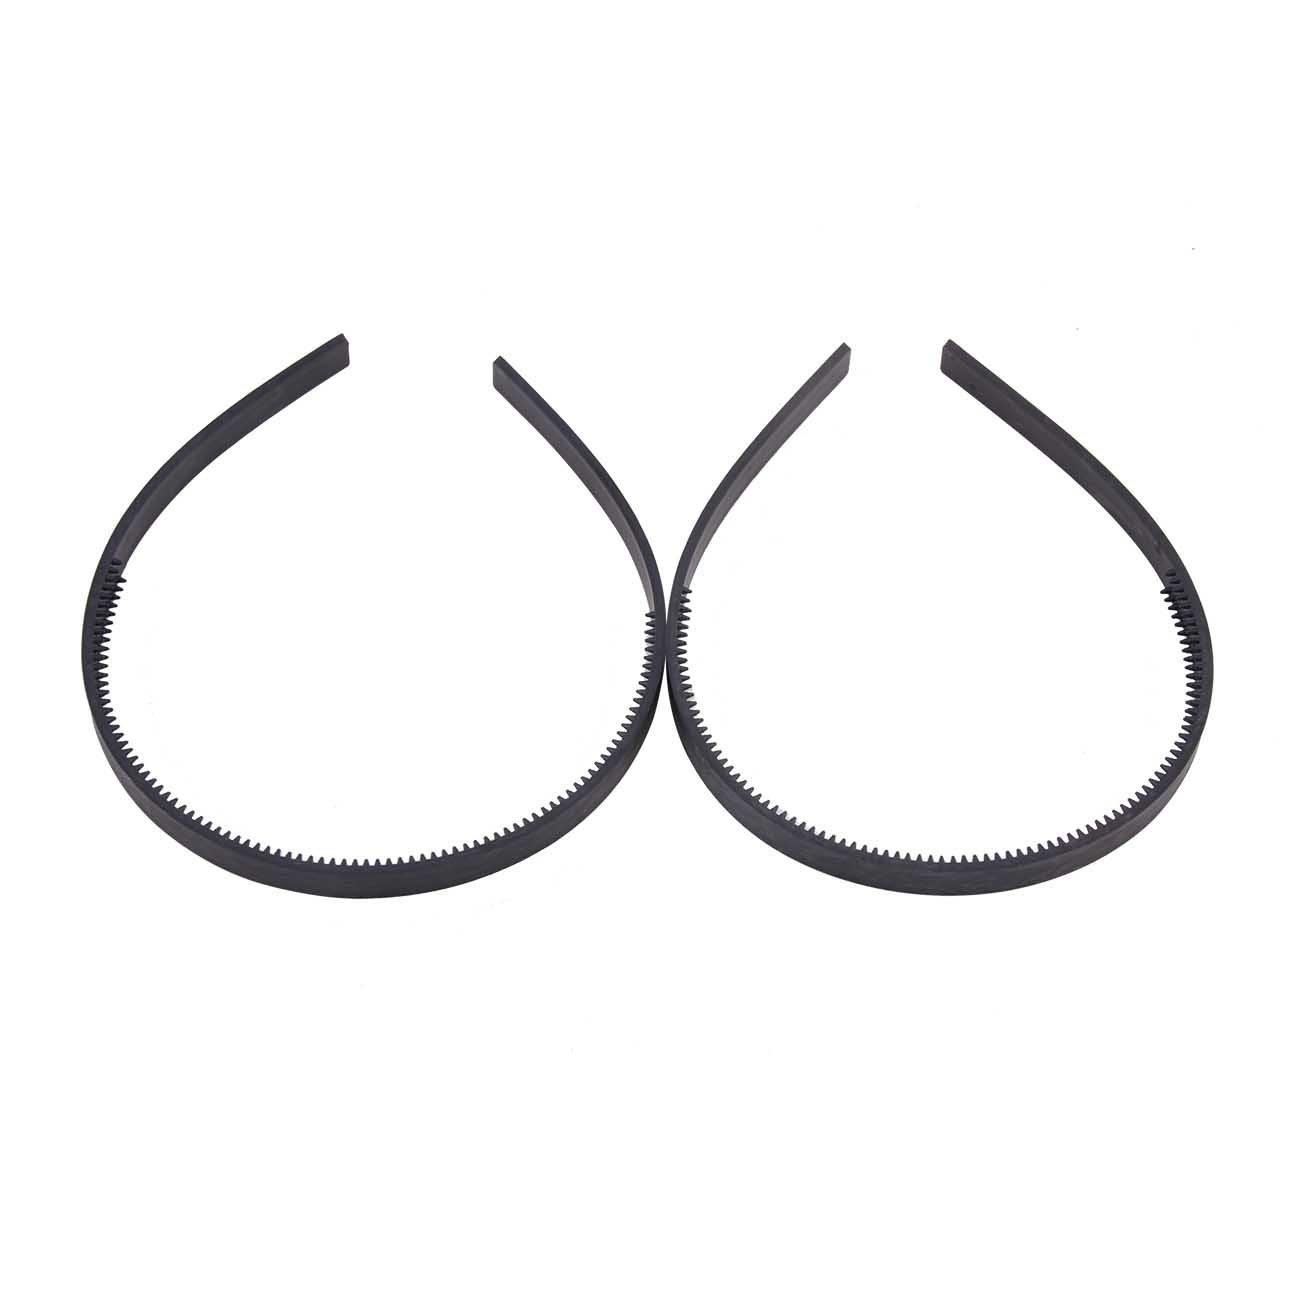 MOHOT Width Womens Girls Plain with Teeth Plastic DIY Hair Accessories Headbands Headwears 36pcs Per Pack